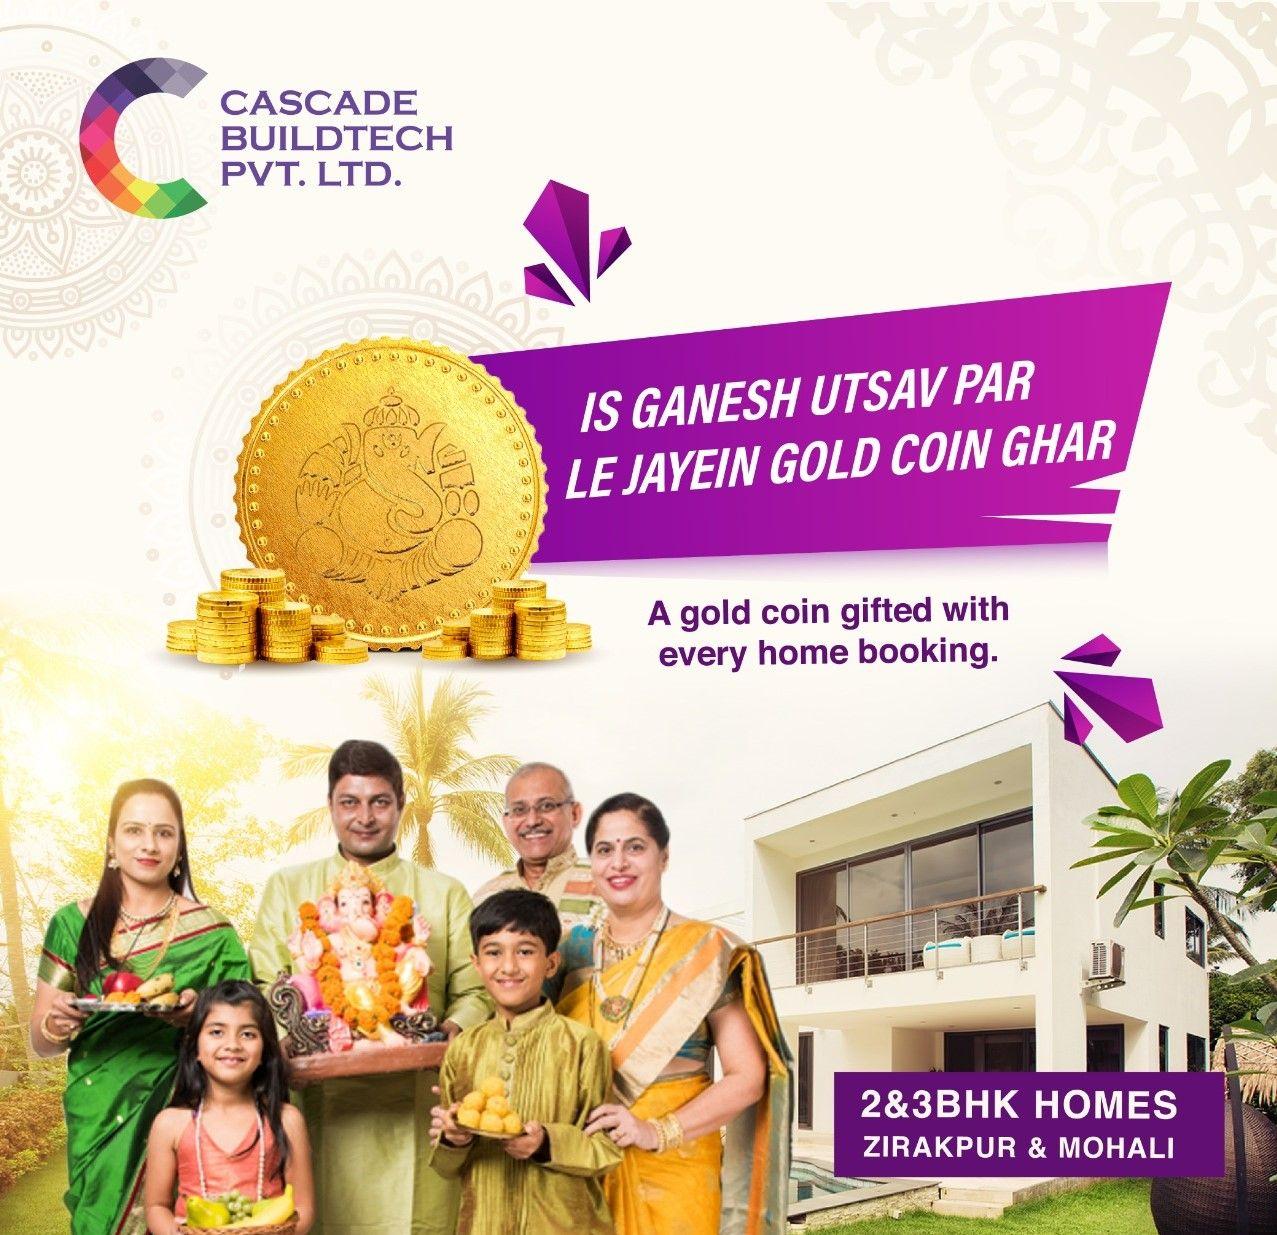 Cascade-buildtech-Real-Estate-Offer-for-Home-Buyers-on Ganesh Utsav